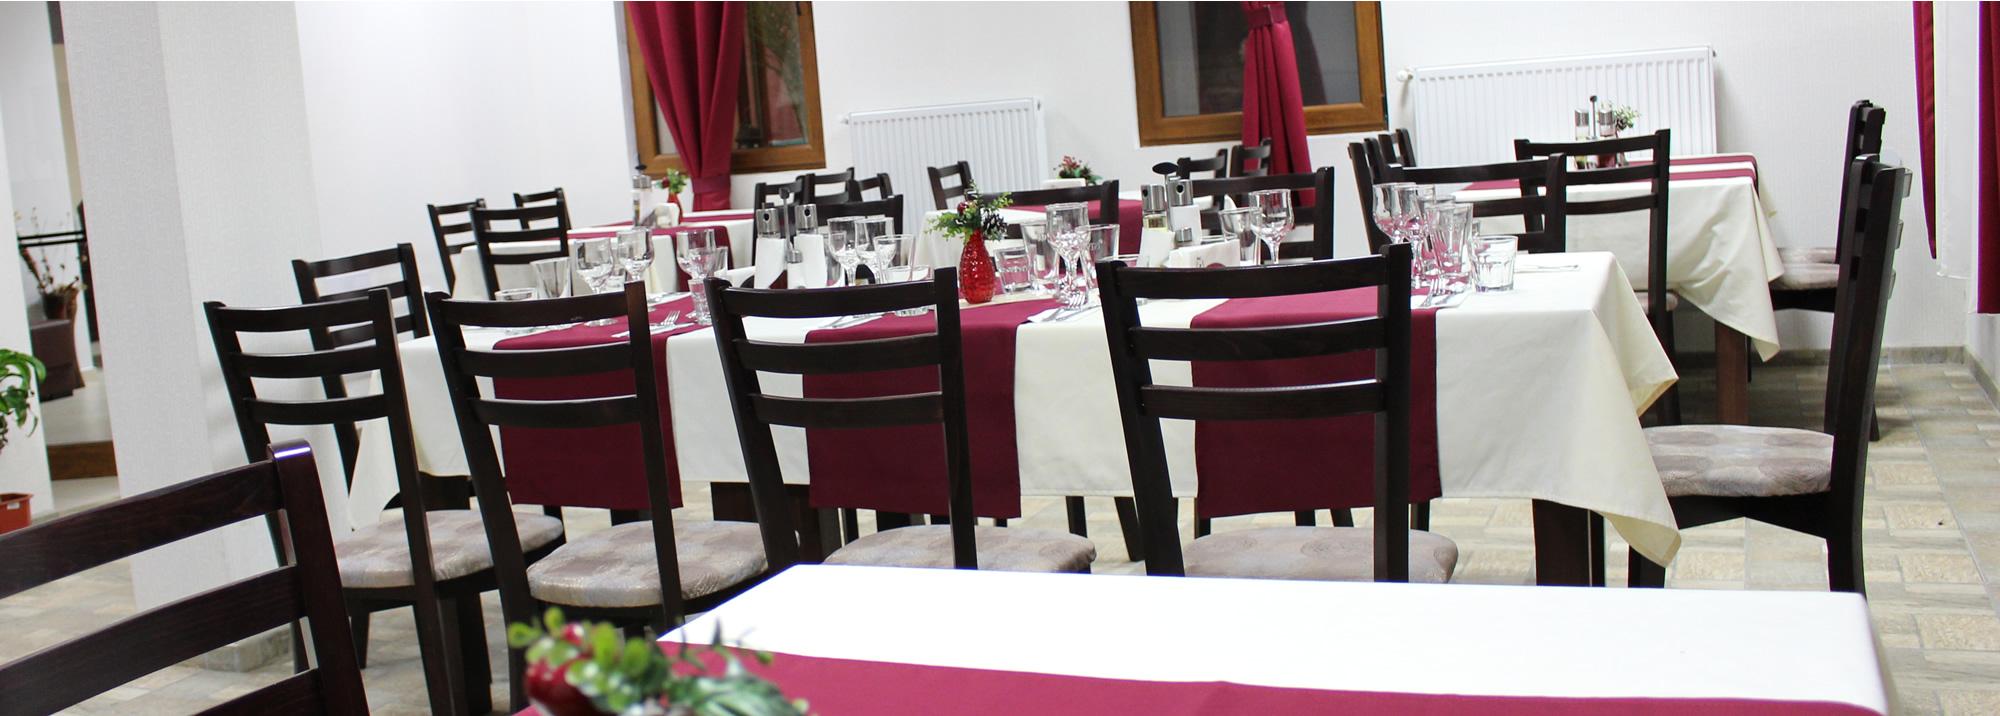 http://complexmagura.com/wp-content/uploads/2016/03/restaurant2.jpg